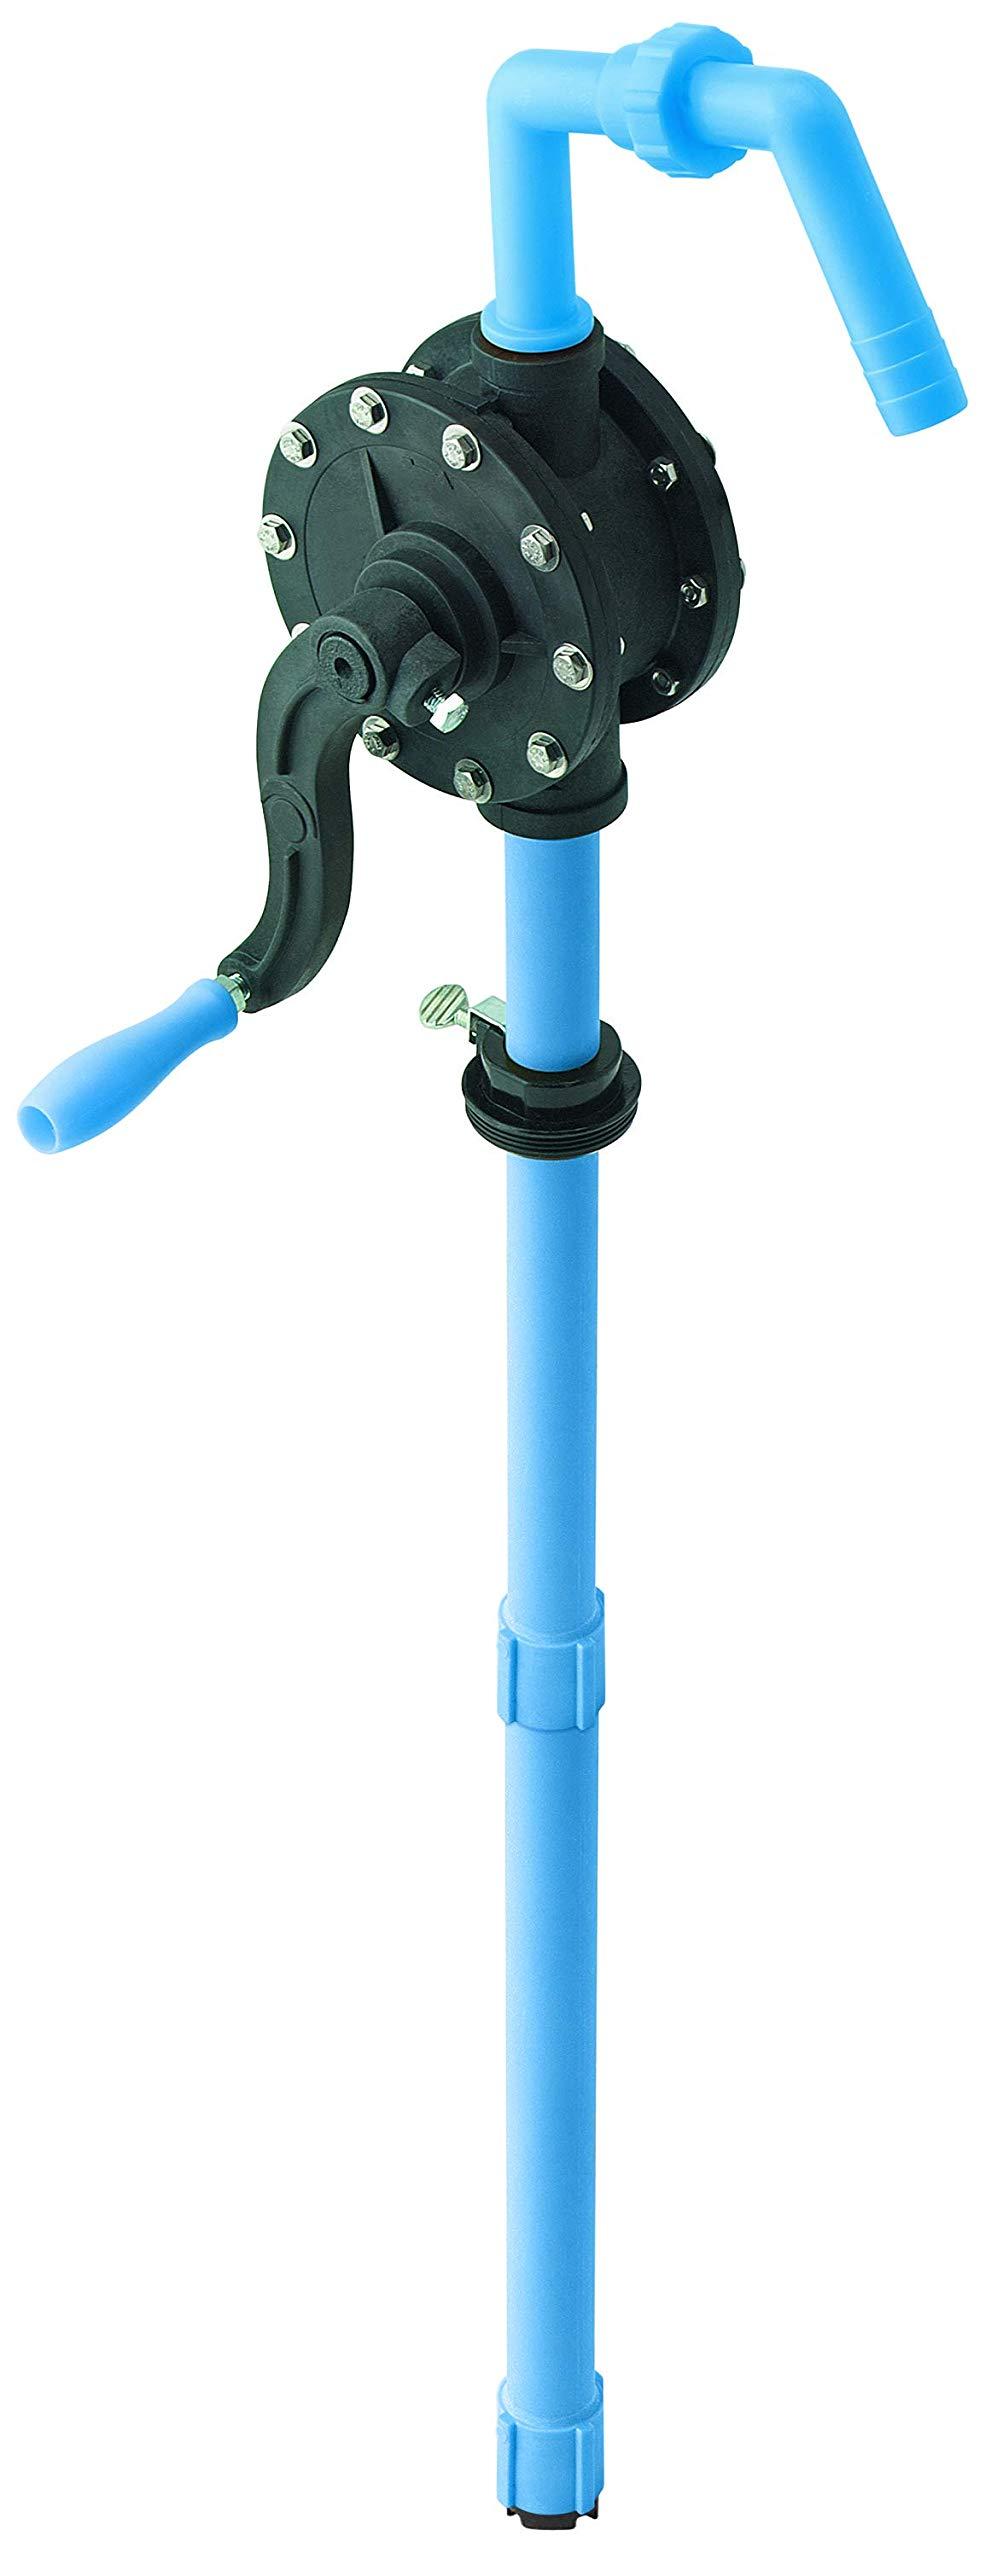 Plews 55-155 Ryton DEF Rotary Barrel Pump